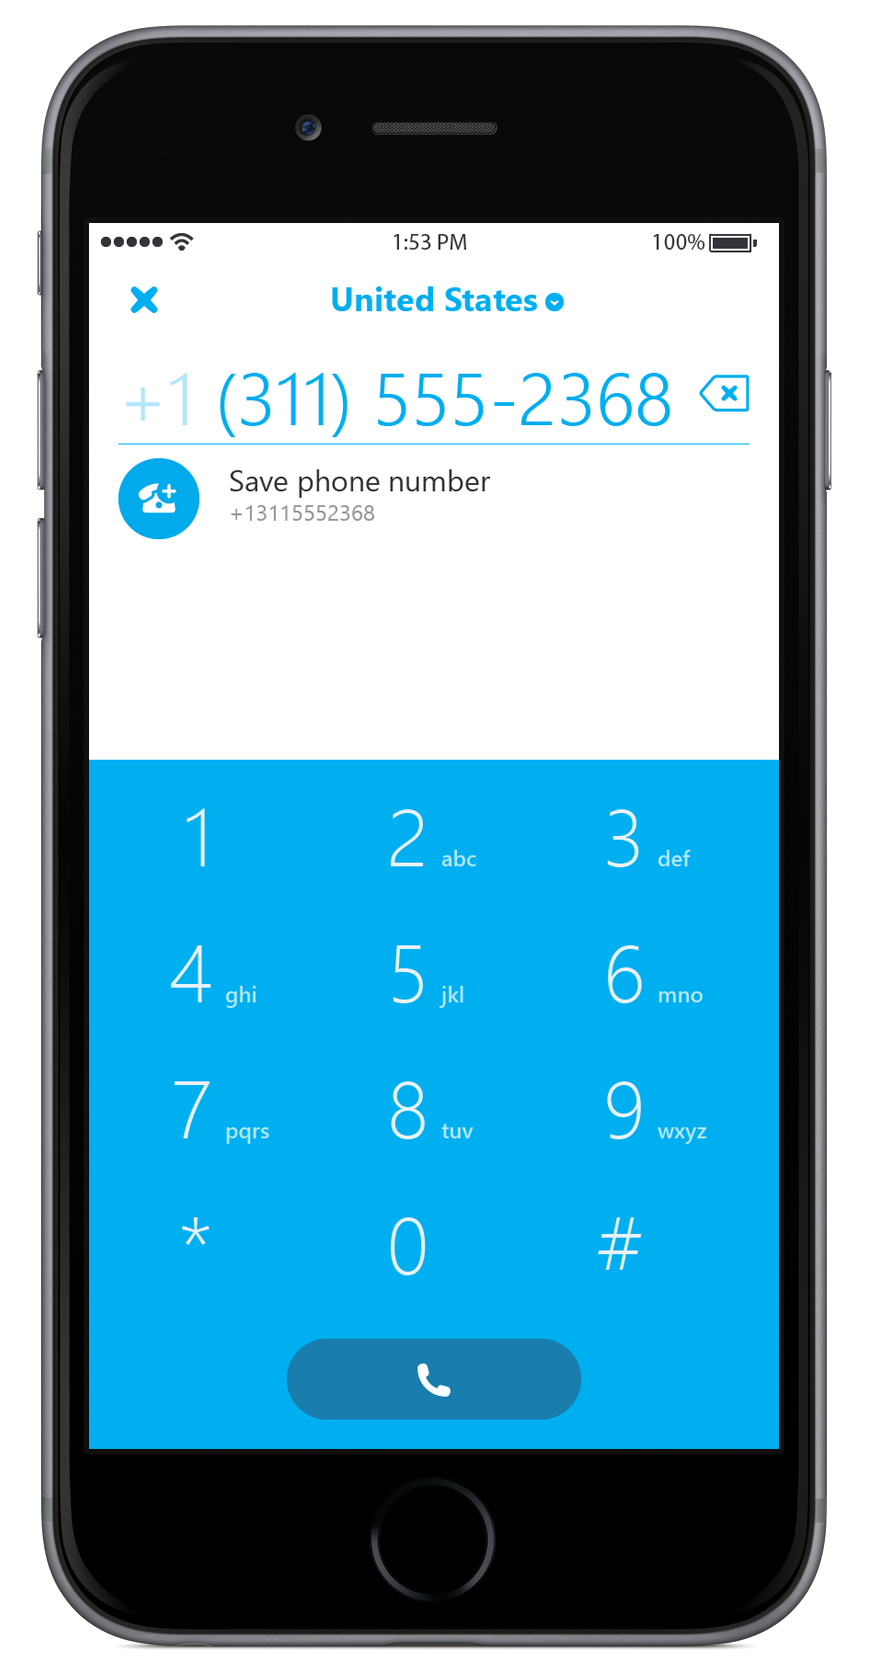 Skype 5.10 for iPhone dialer